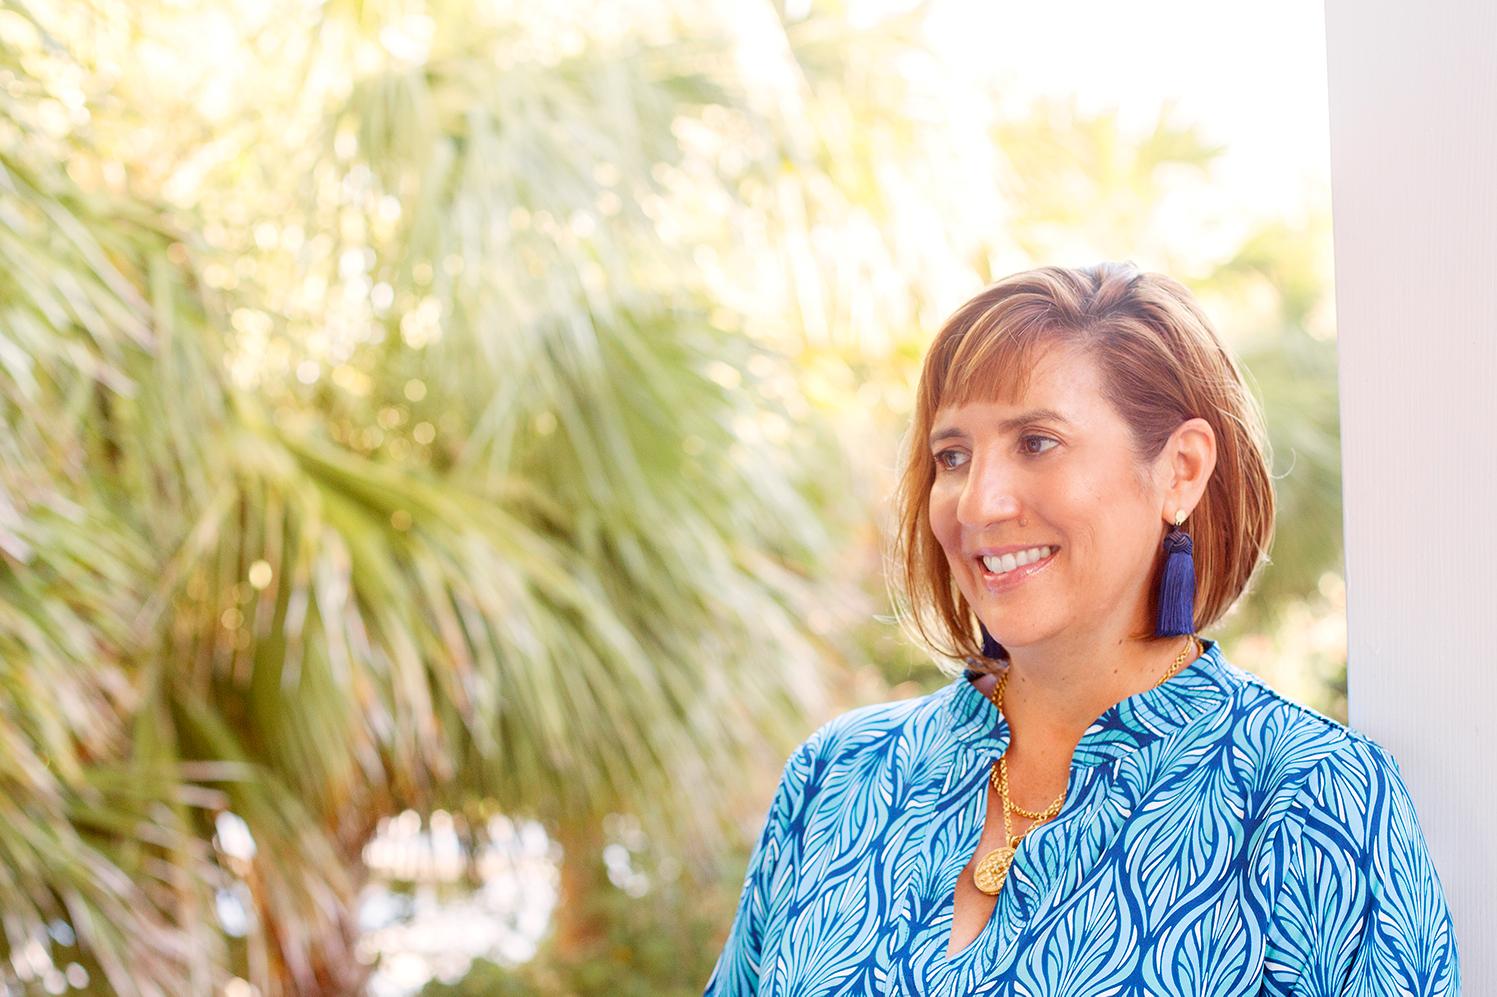 Founder of Escapada Living, Natalia Castillo